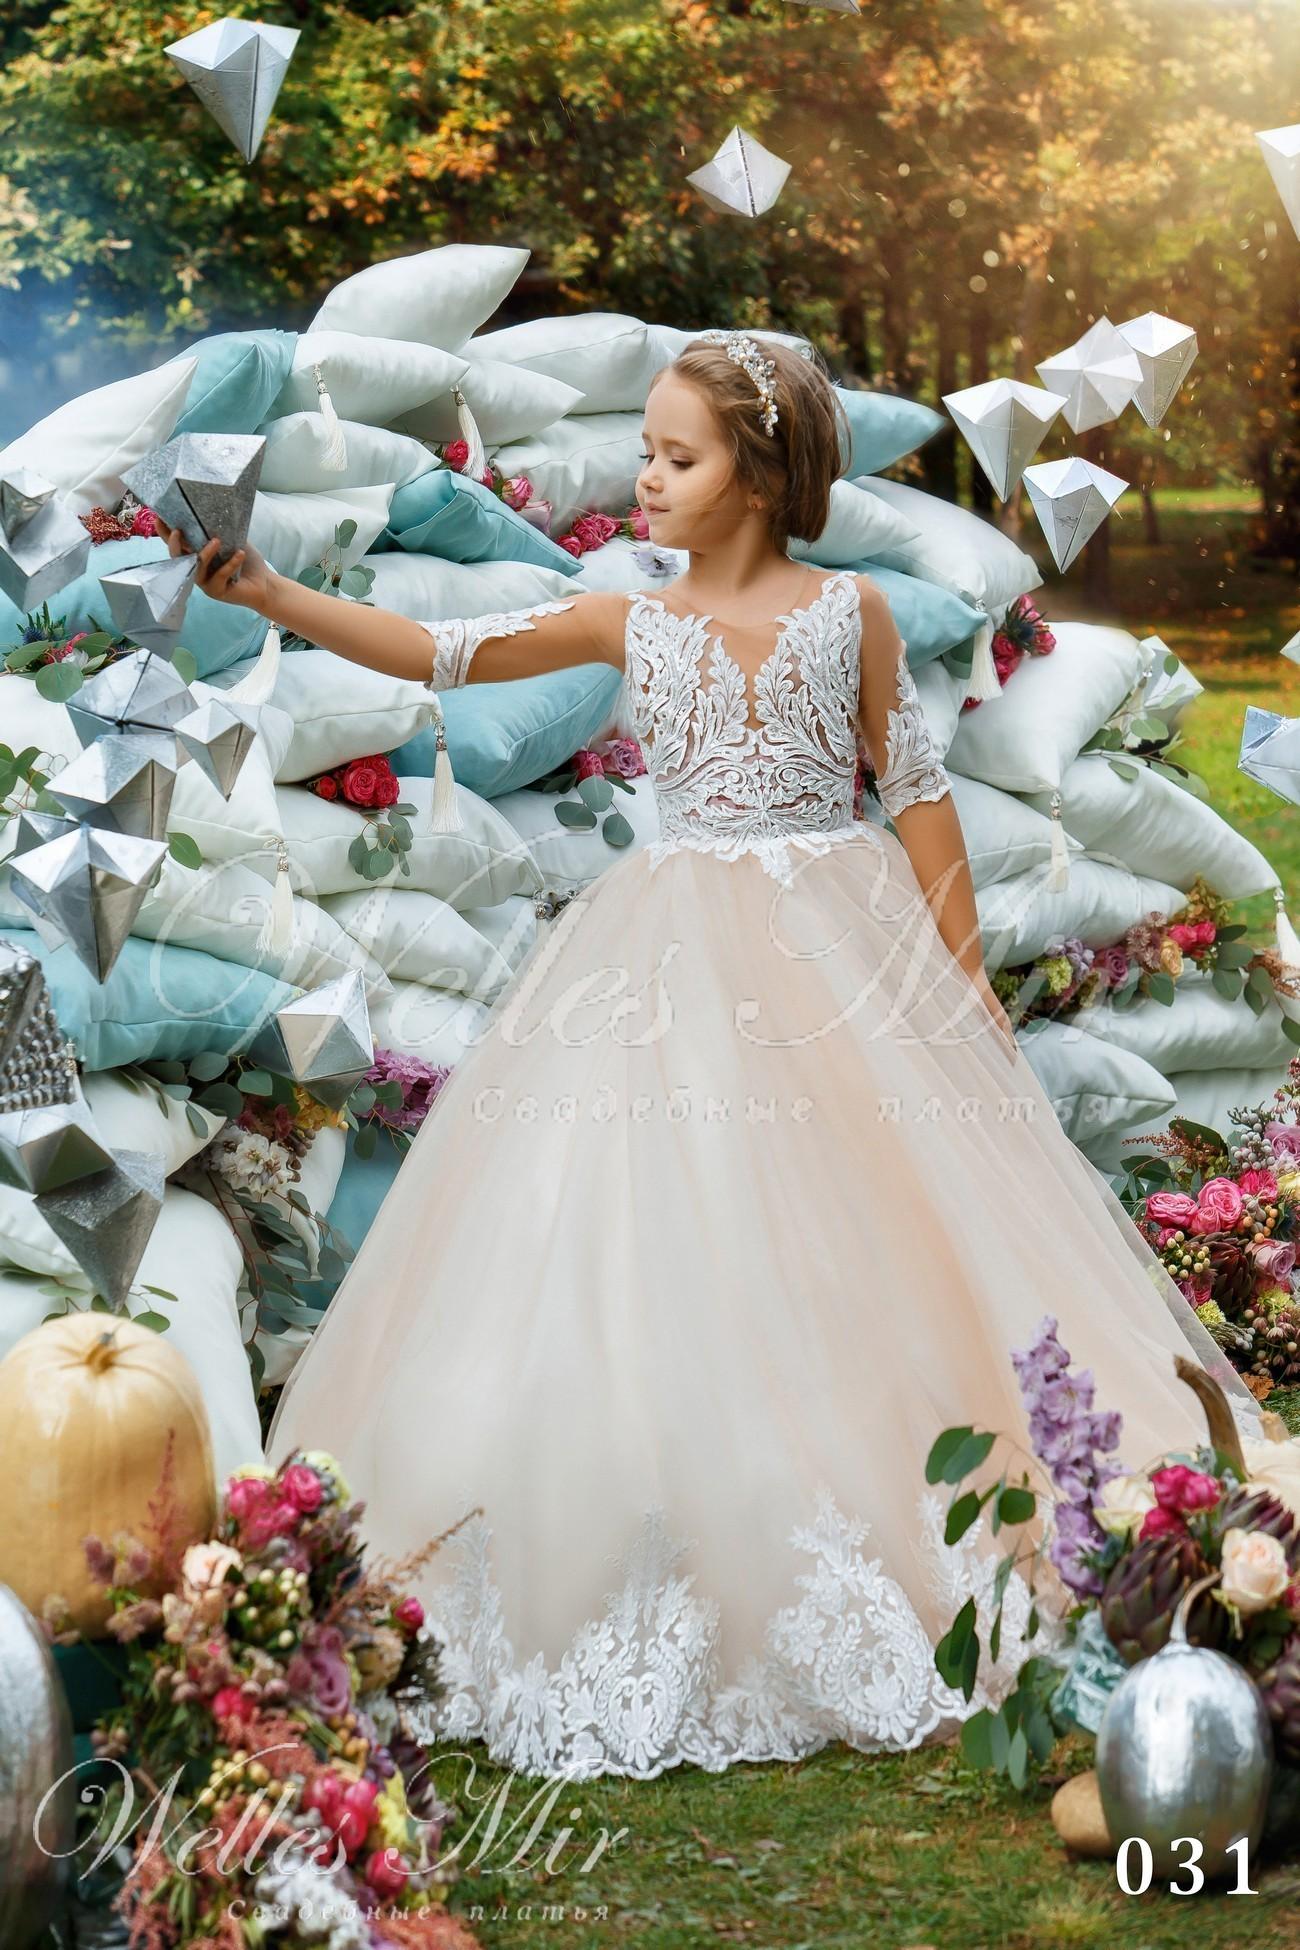 Дитячі сукні Kids Deluxe Collection 2018 - 031